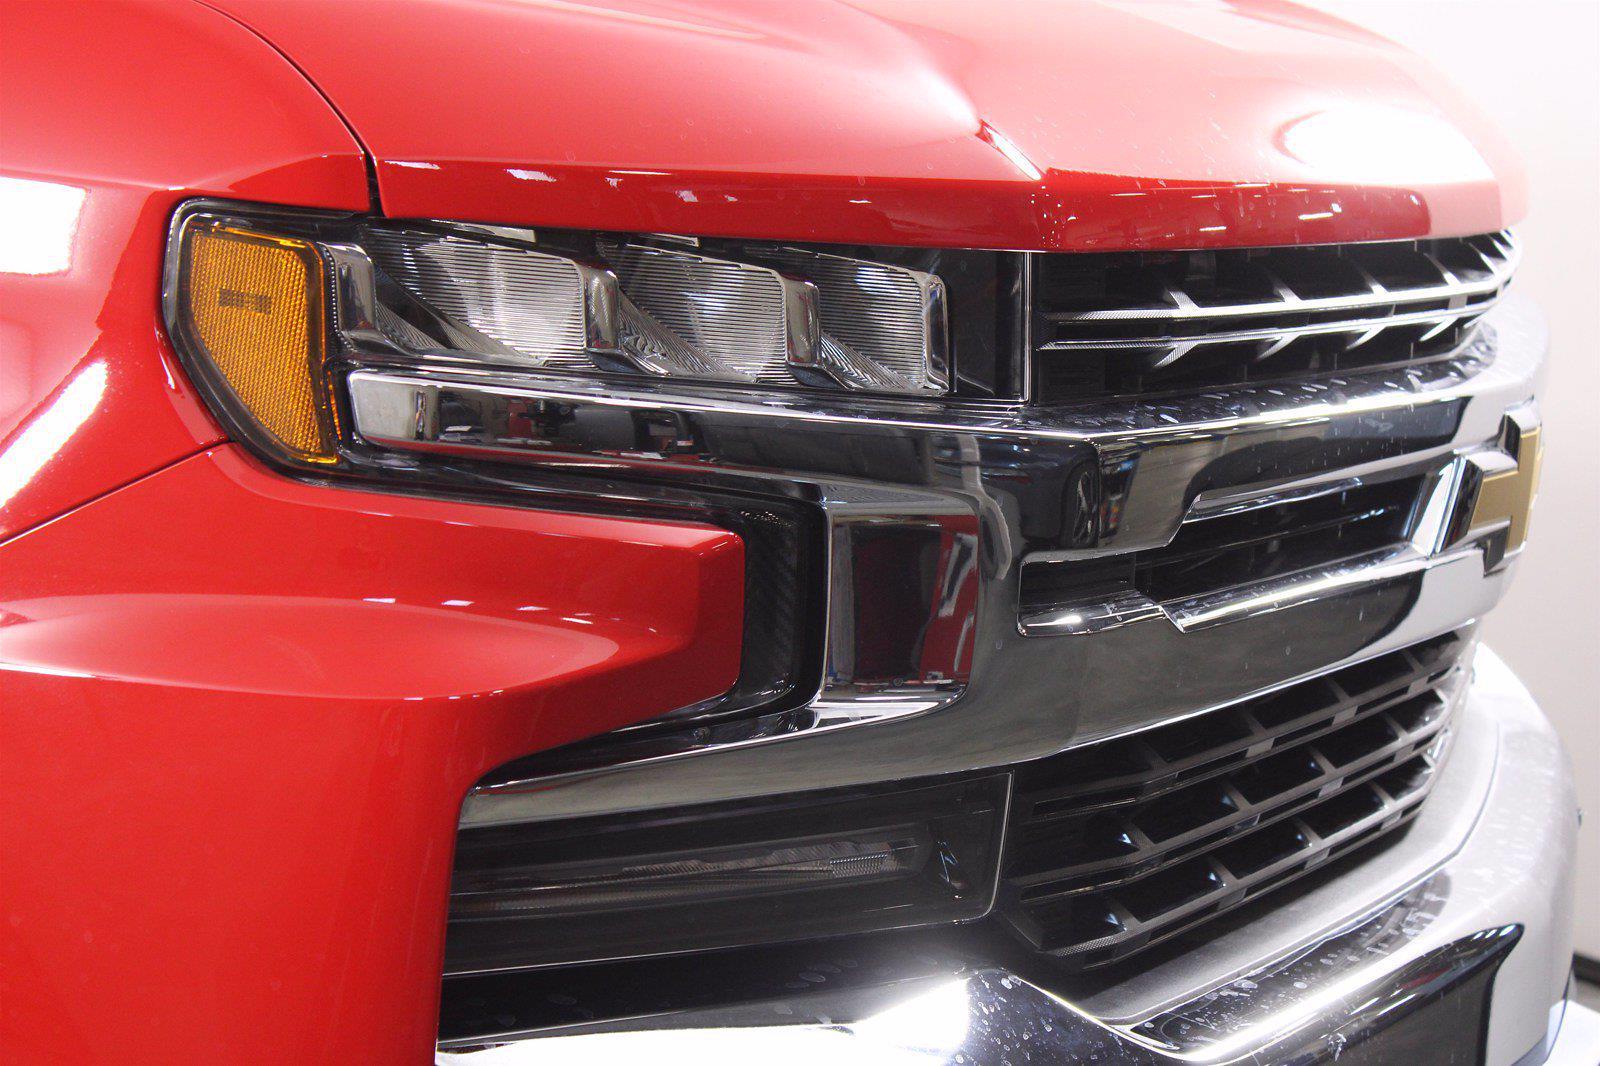 2021 Chevrolet Silverado 1500 Crew Cab 4x4, Pickup #D110819 - photo 5